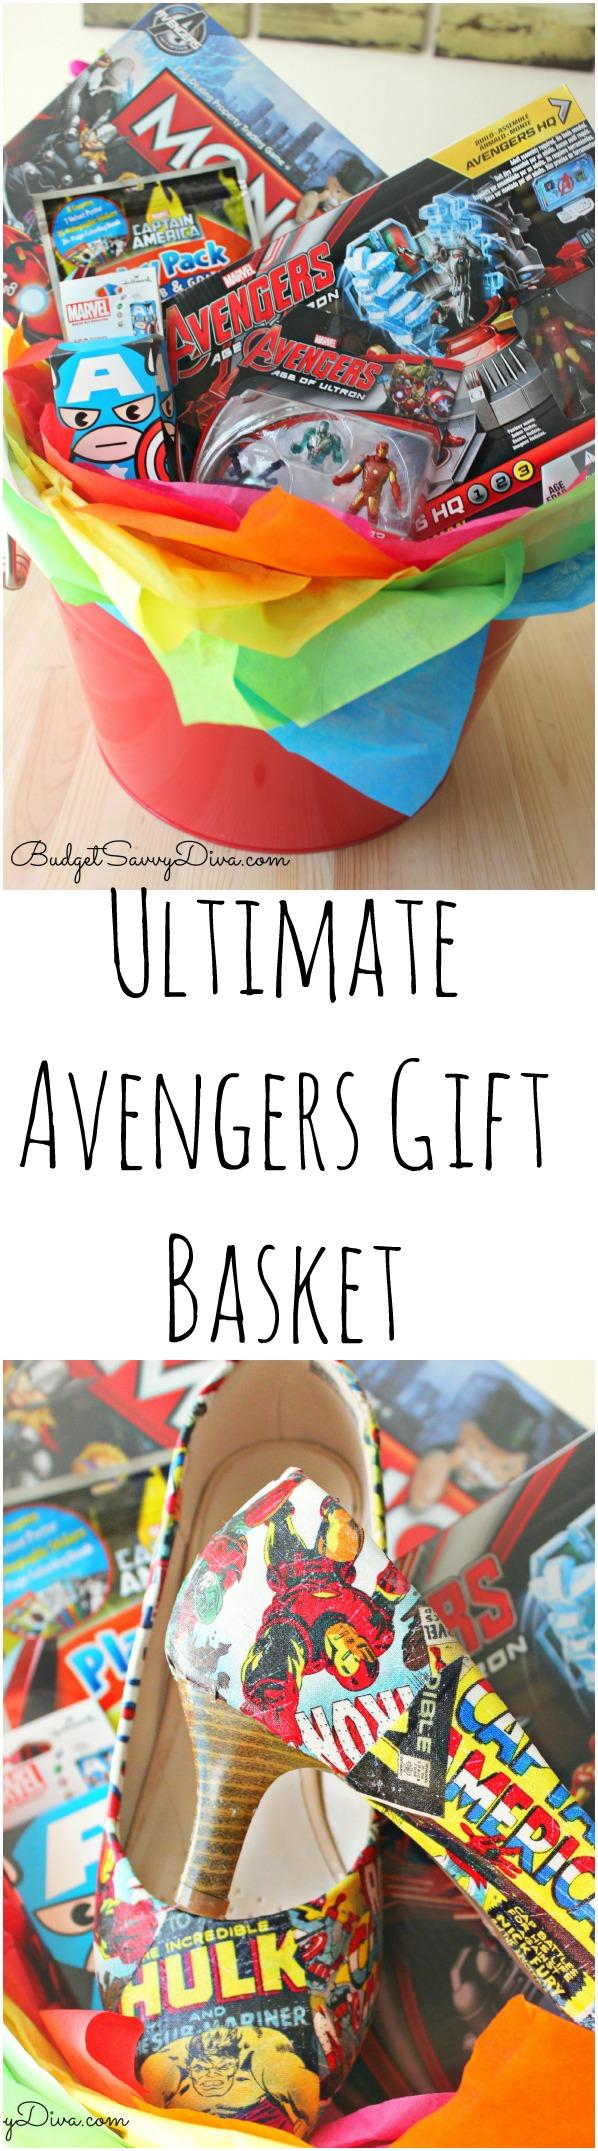 FINAL Gift Basket